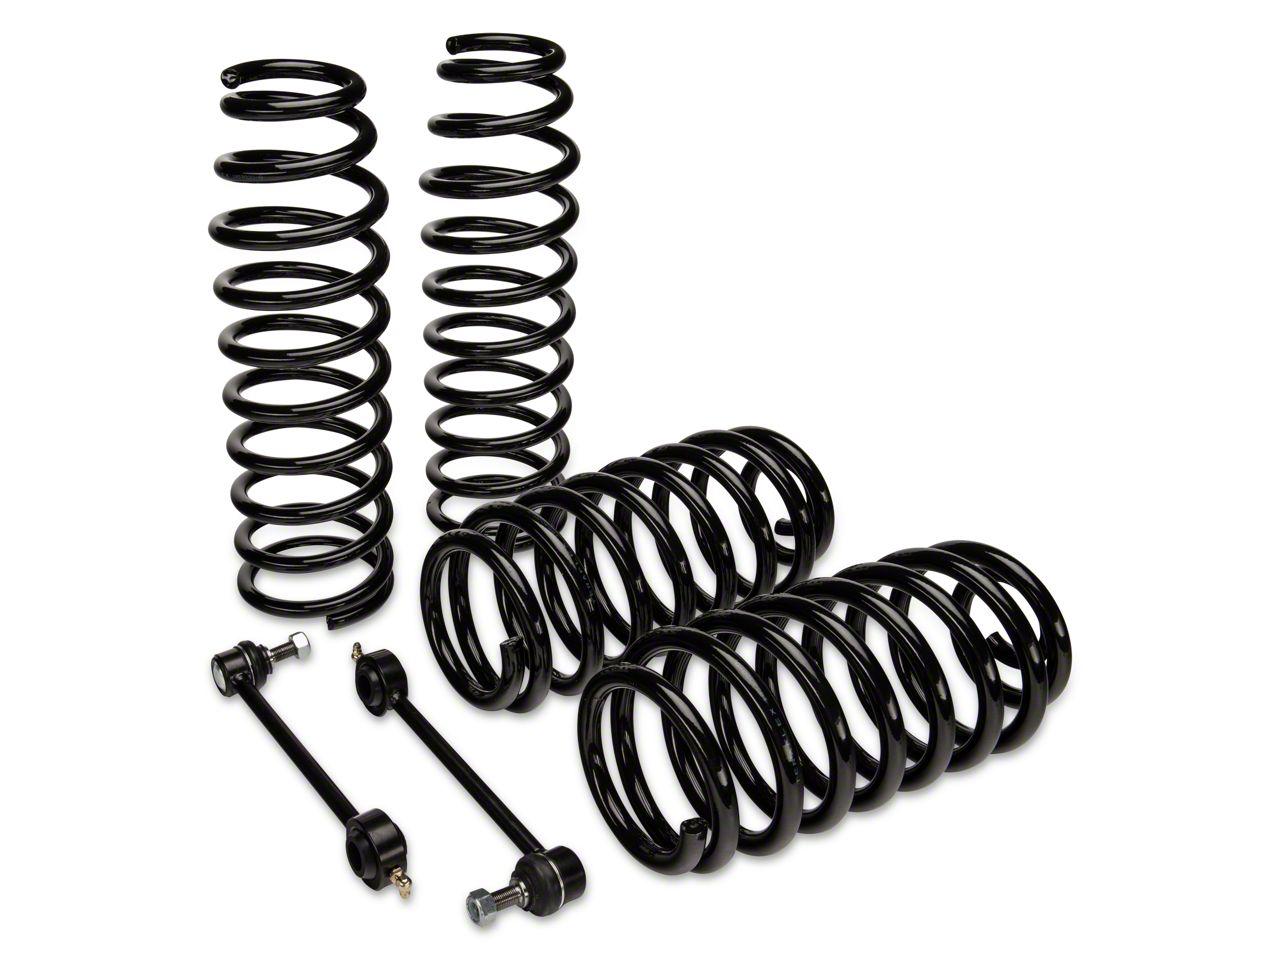 teraflex jeep wrangler performance leveling kit 1351502 07 18 jeep Wrangler YJ Interior teraflex jeep wrangler performance leveling kit 1351502 07 18 jeep wrangler jk 2 door